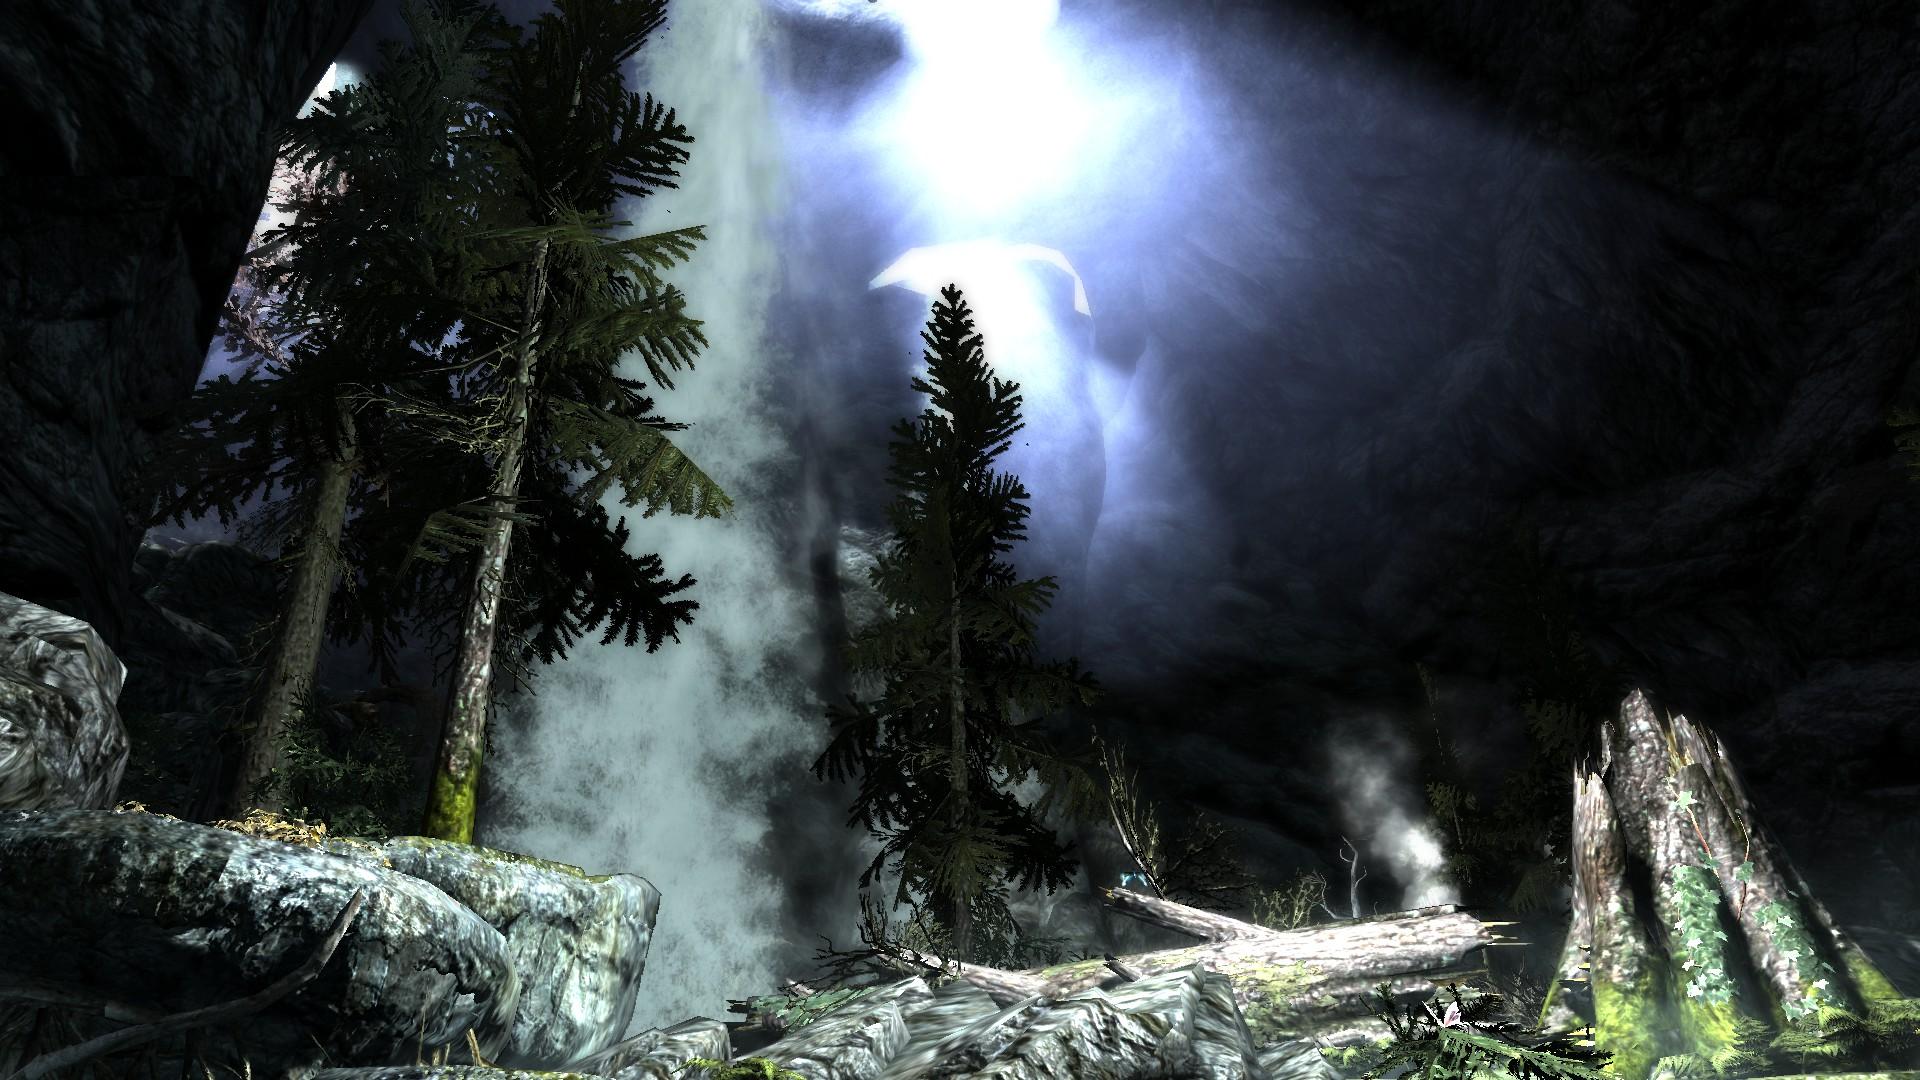 72850_screenshots_20160520225120_1.jpg - Elder Scrolls 5: Skyrim, the